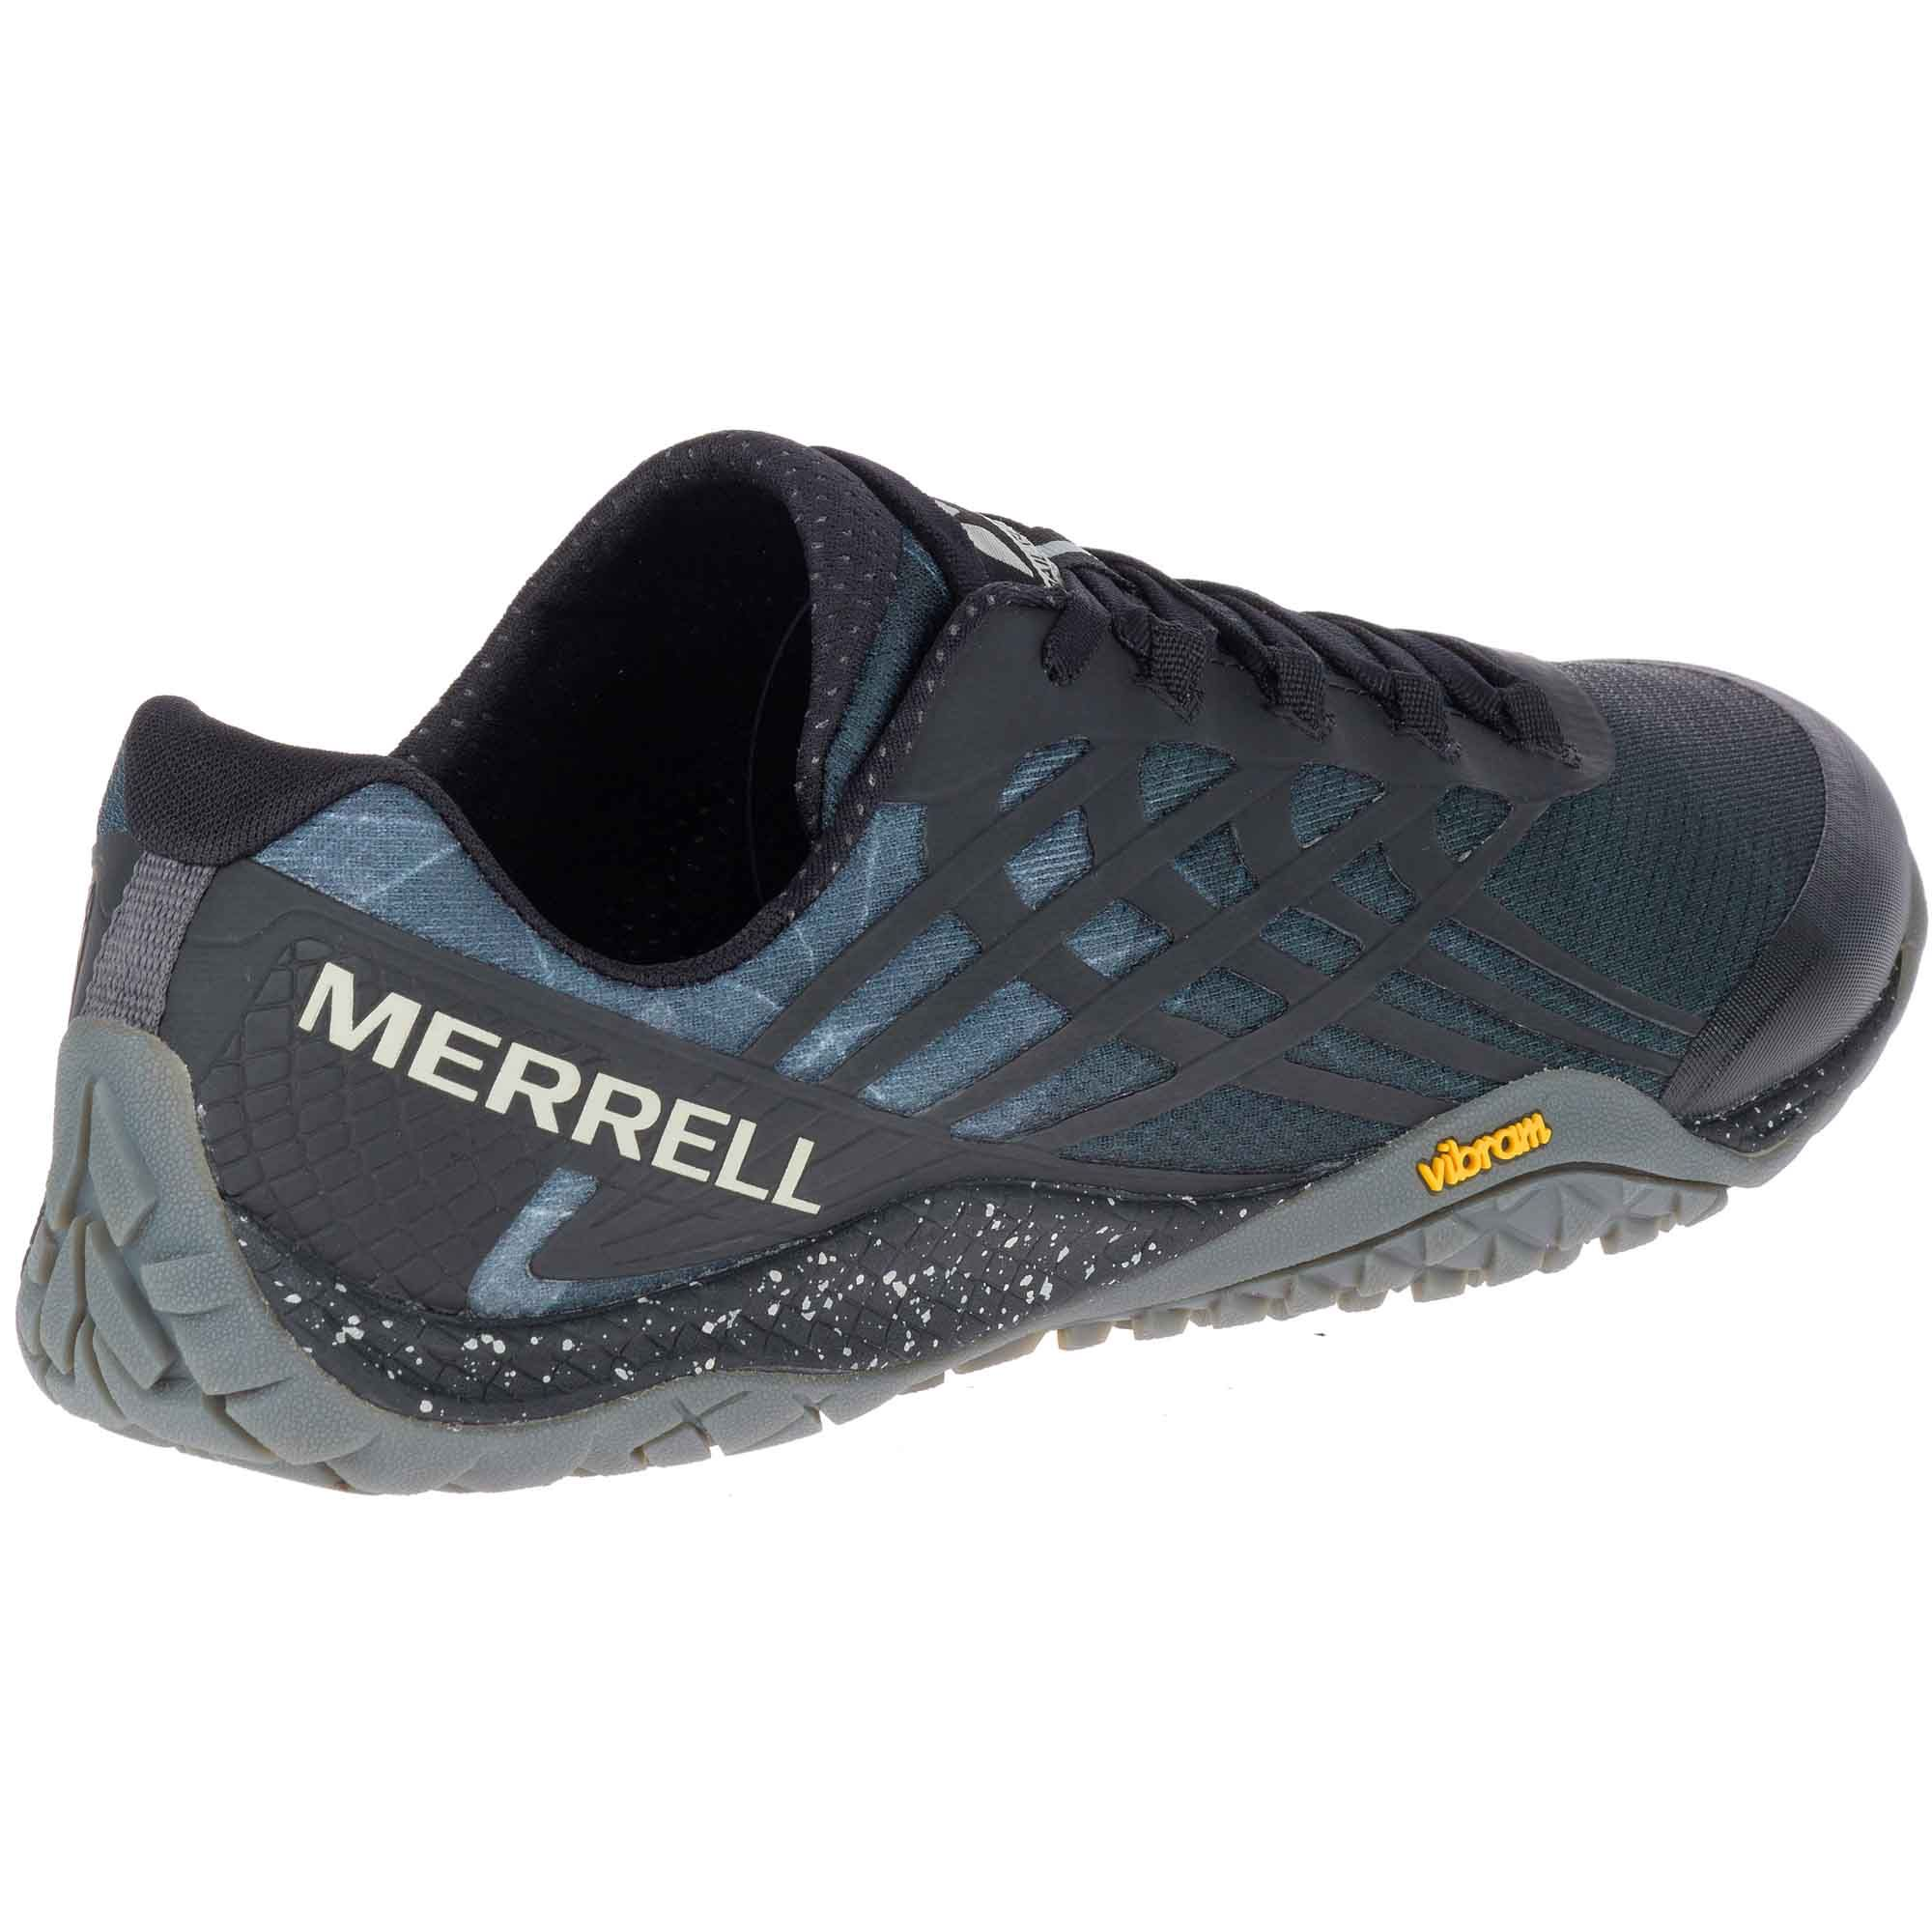 Merrell Black Mens Running Shoes